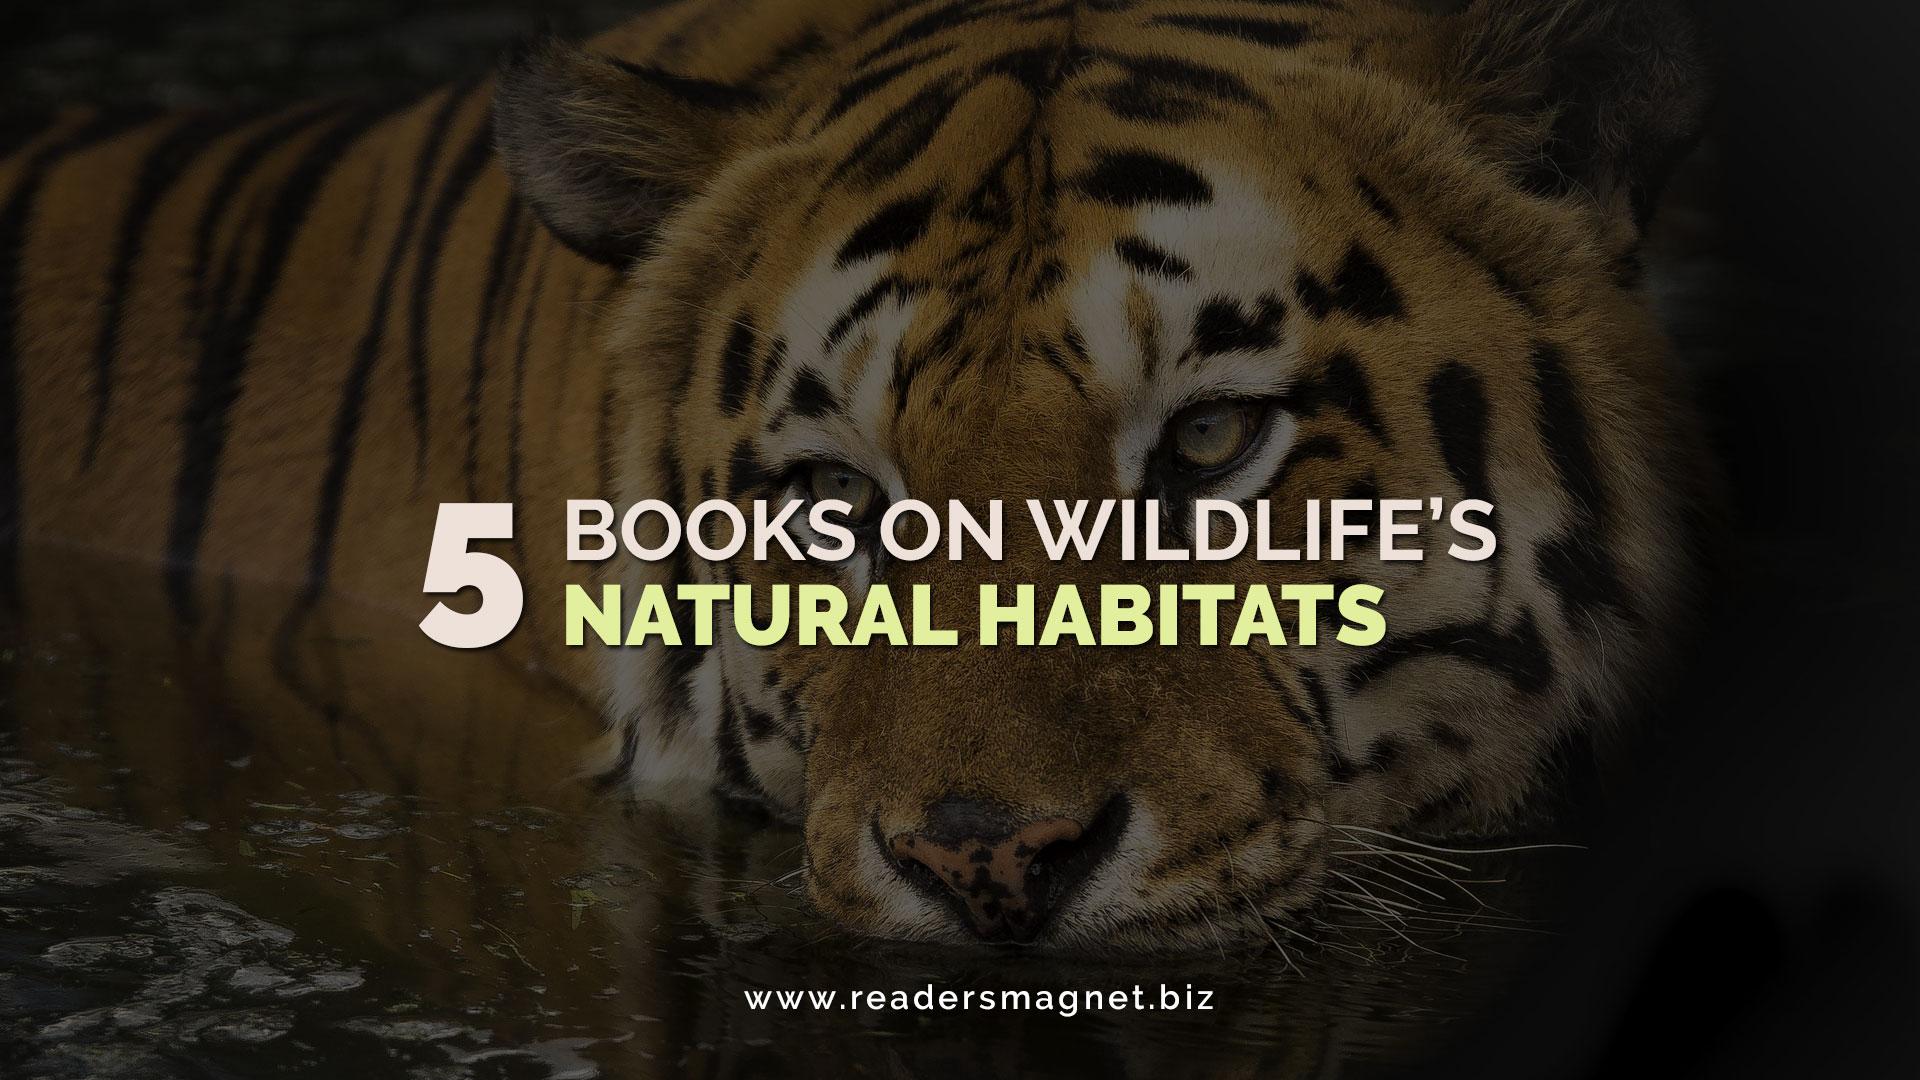 Five-Books-on-Wildlifes-Natural-Habitats banner